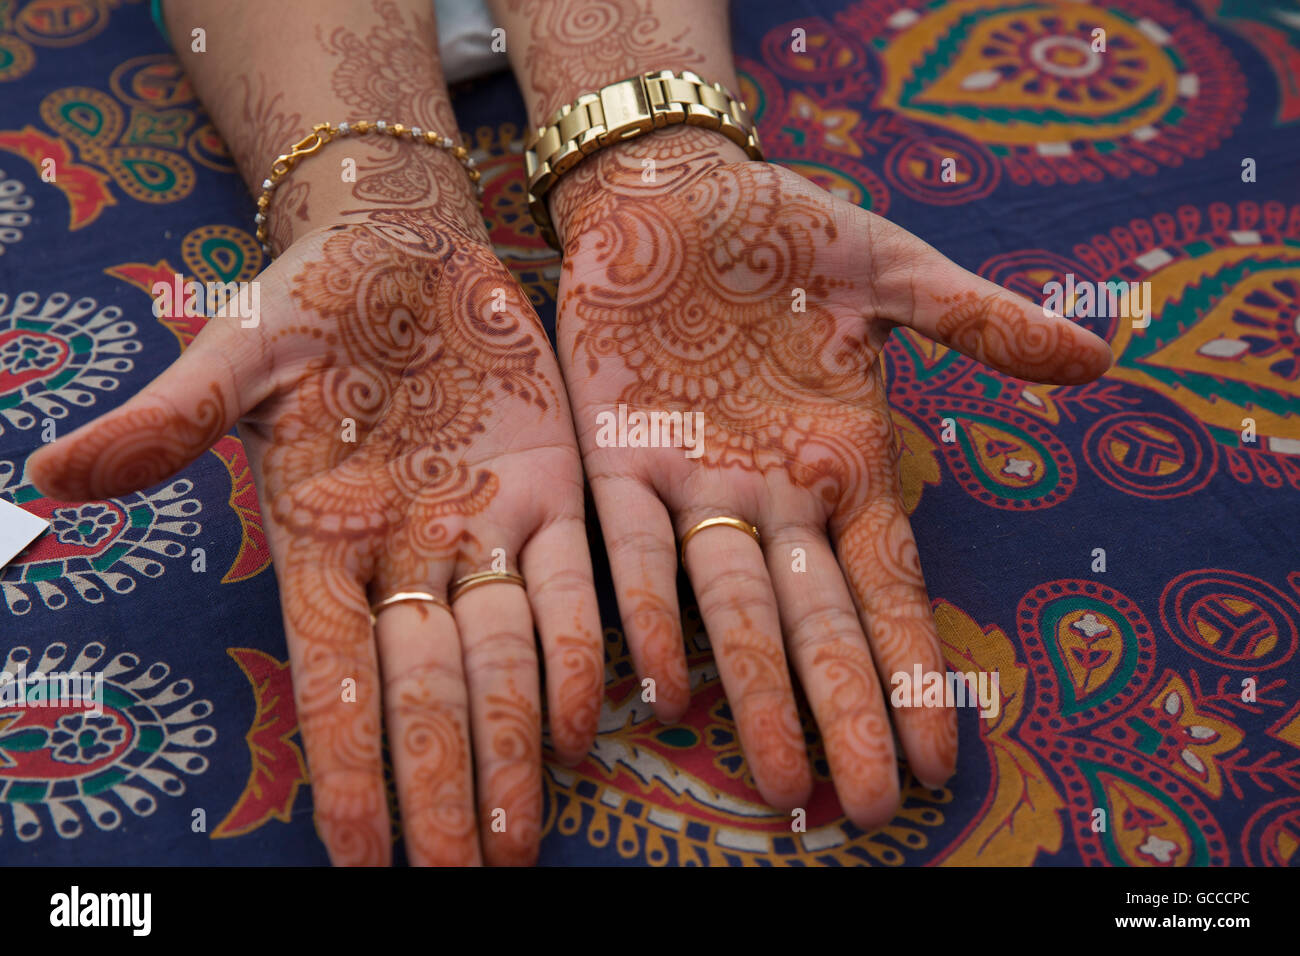 Buy Henna Mehndi Uk : Easy simple beautiful arabic inspired henna mehndi designs for